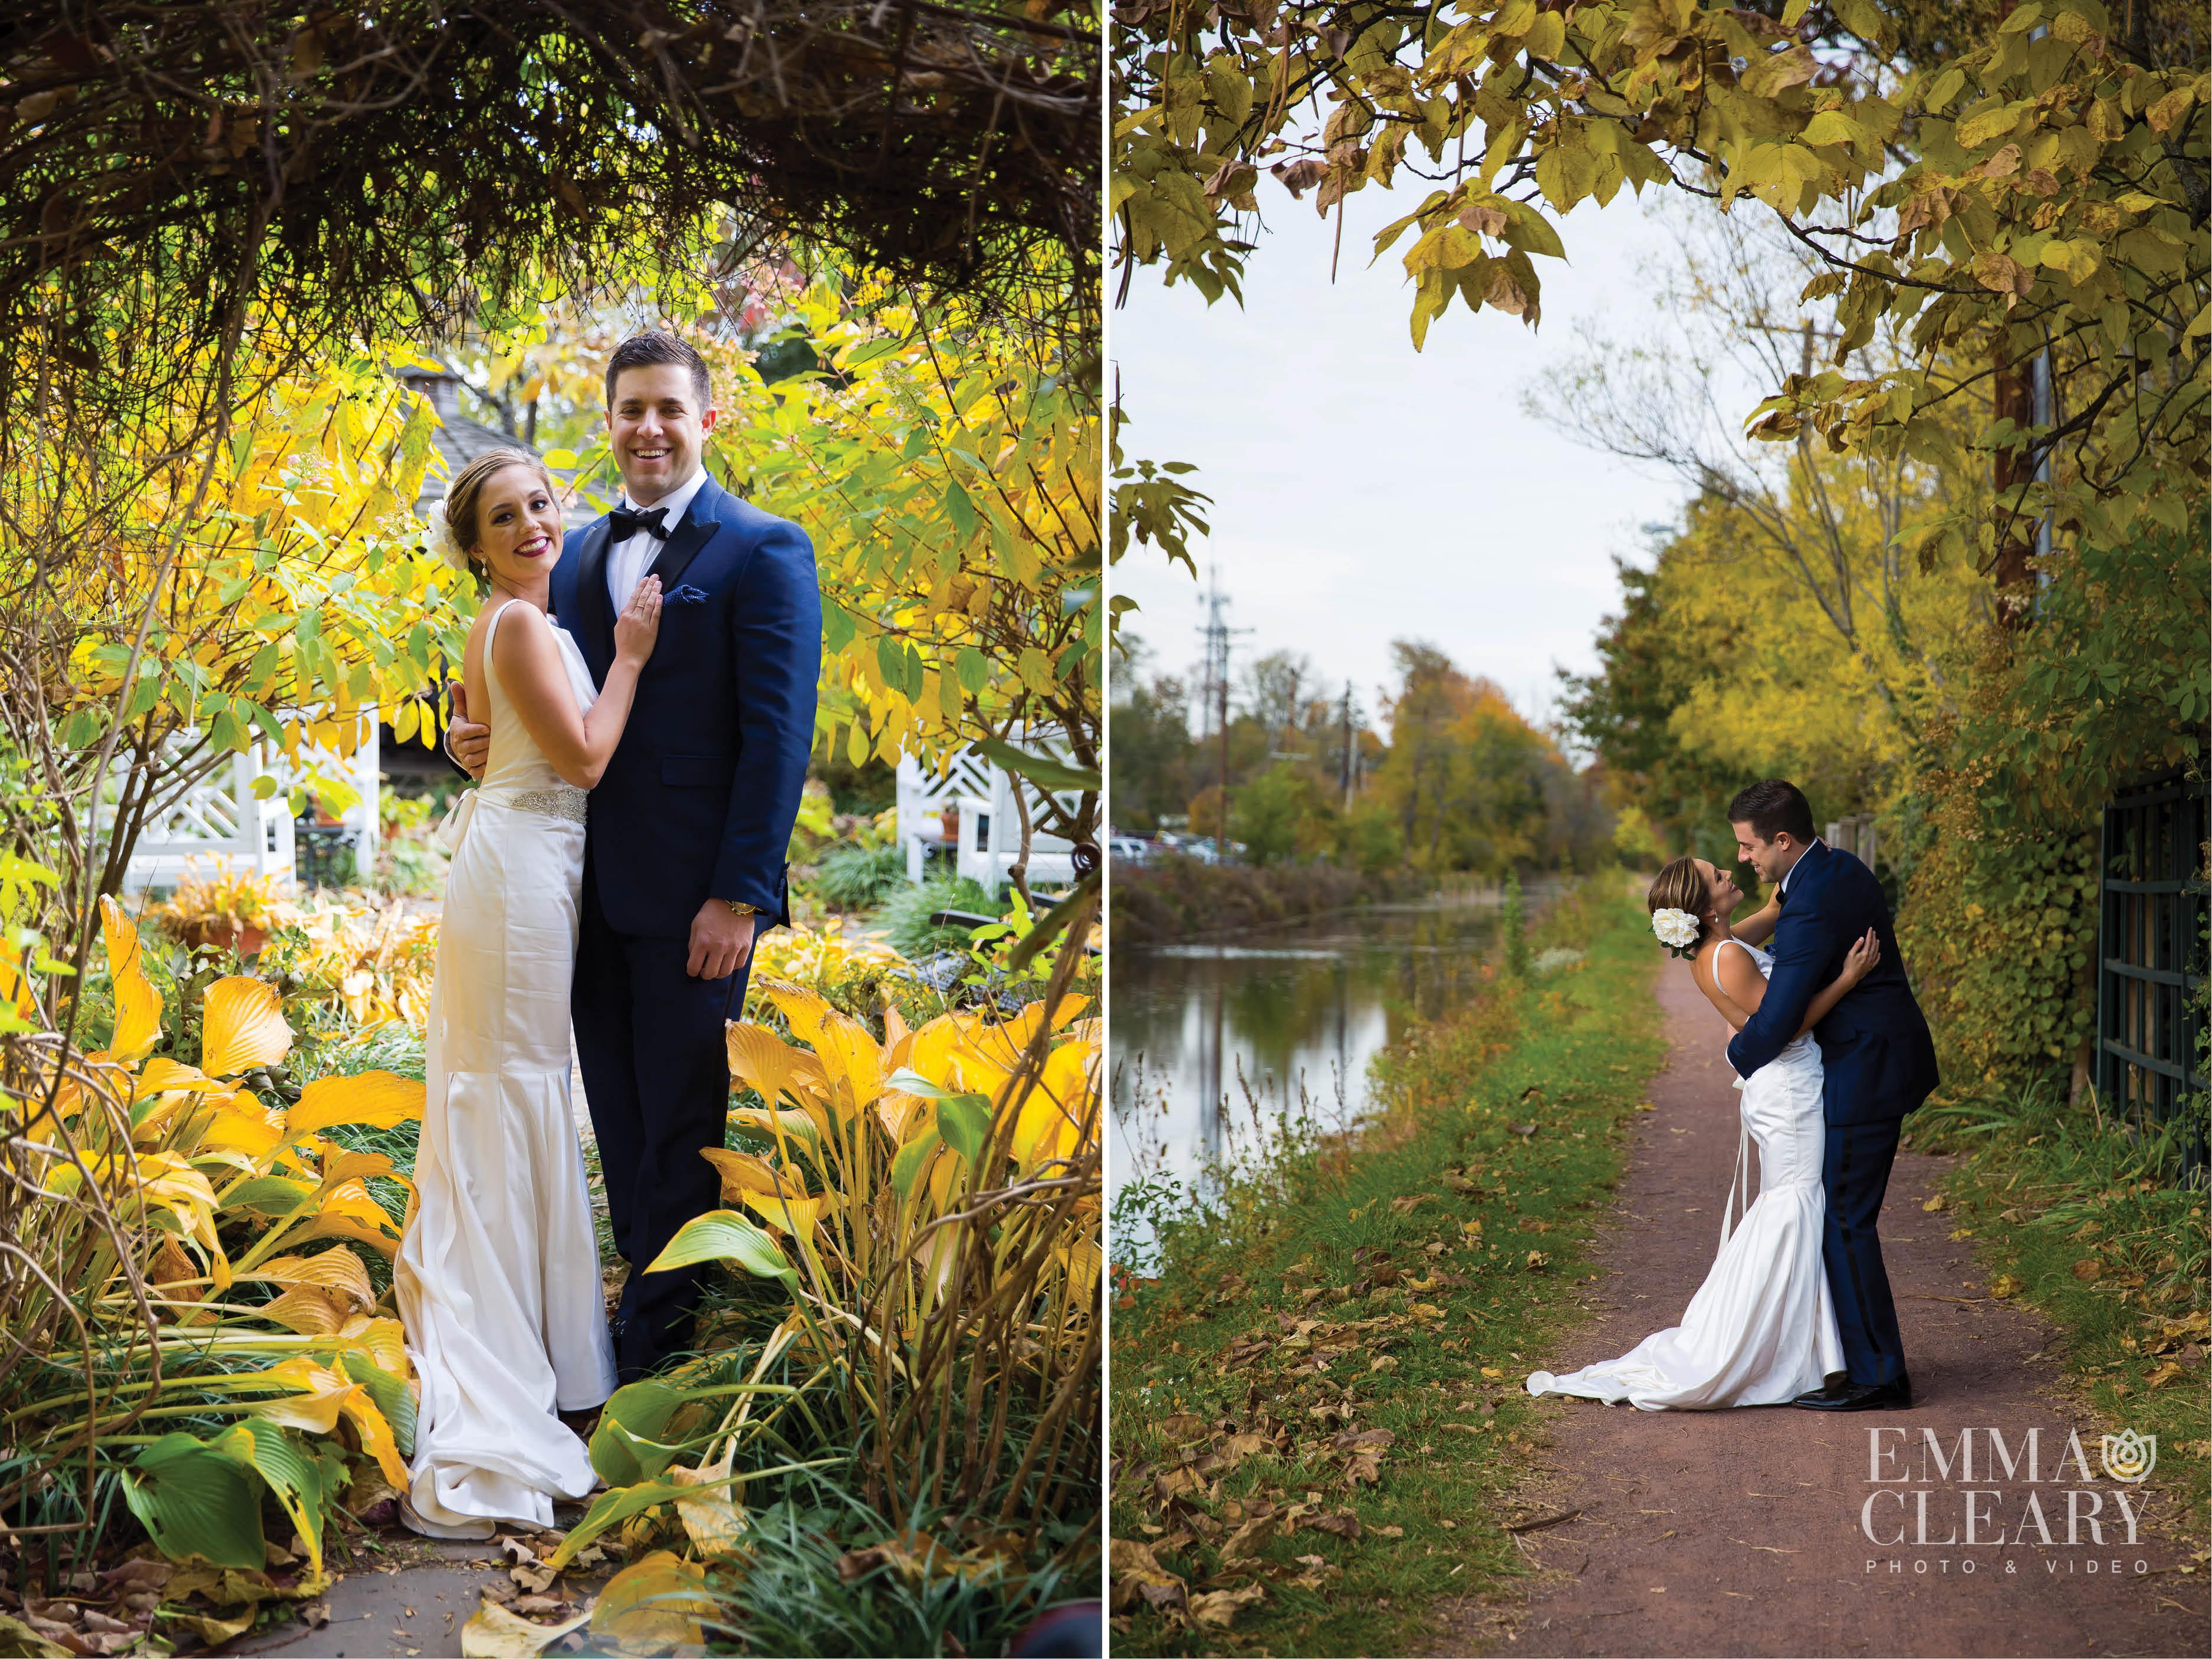 emma_cleary_photography-hotel-du-village-wedding9